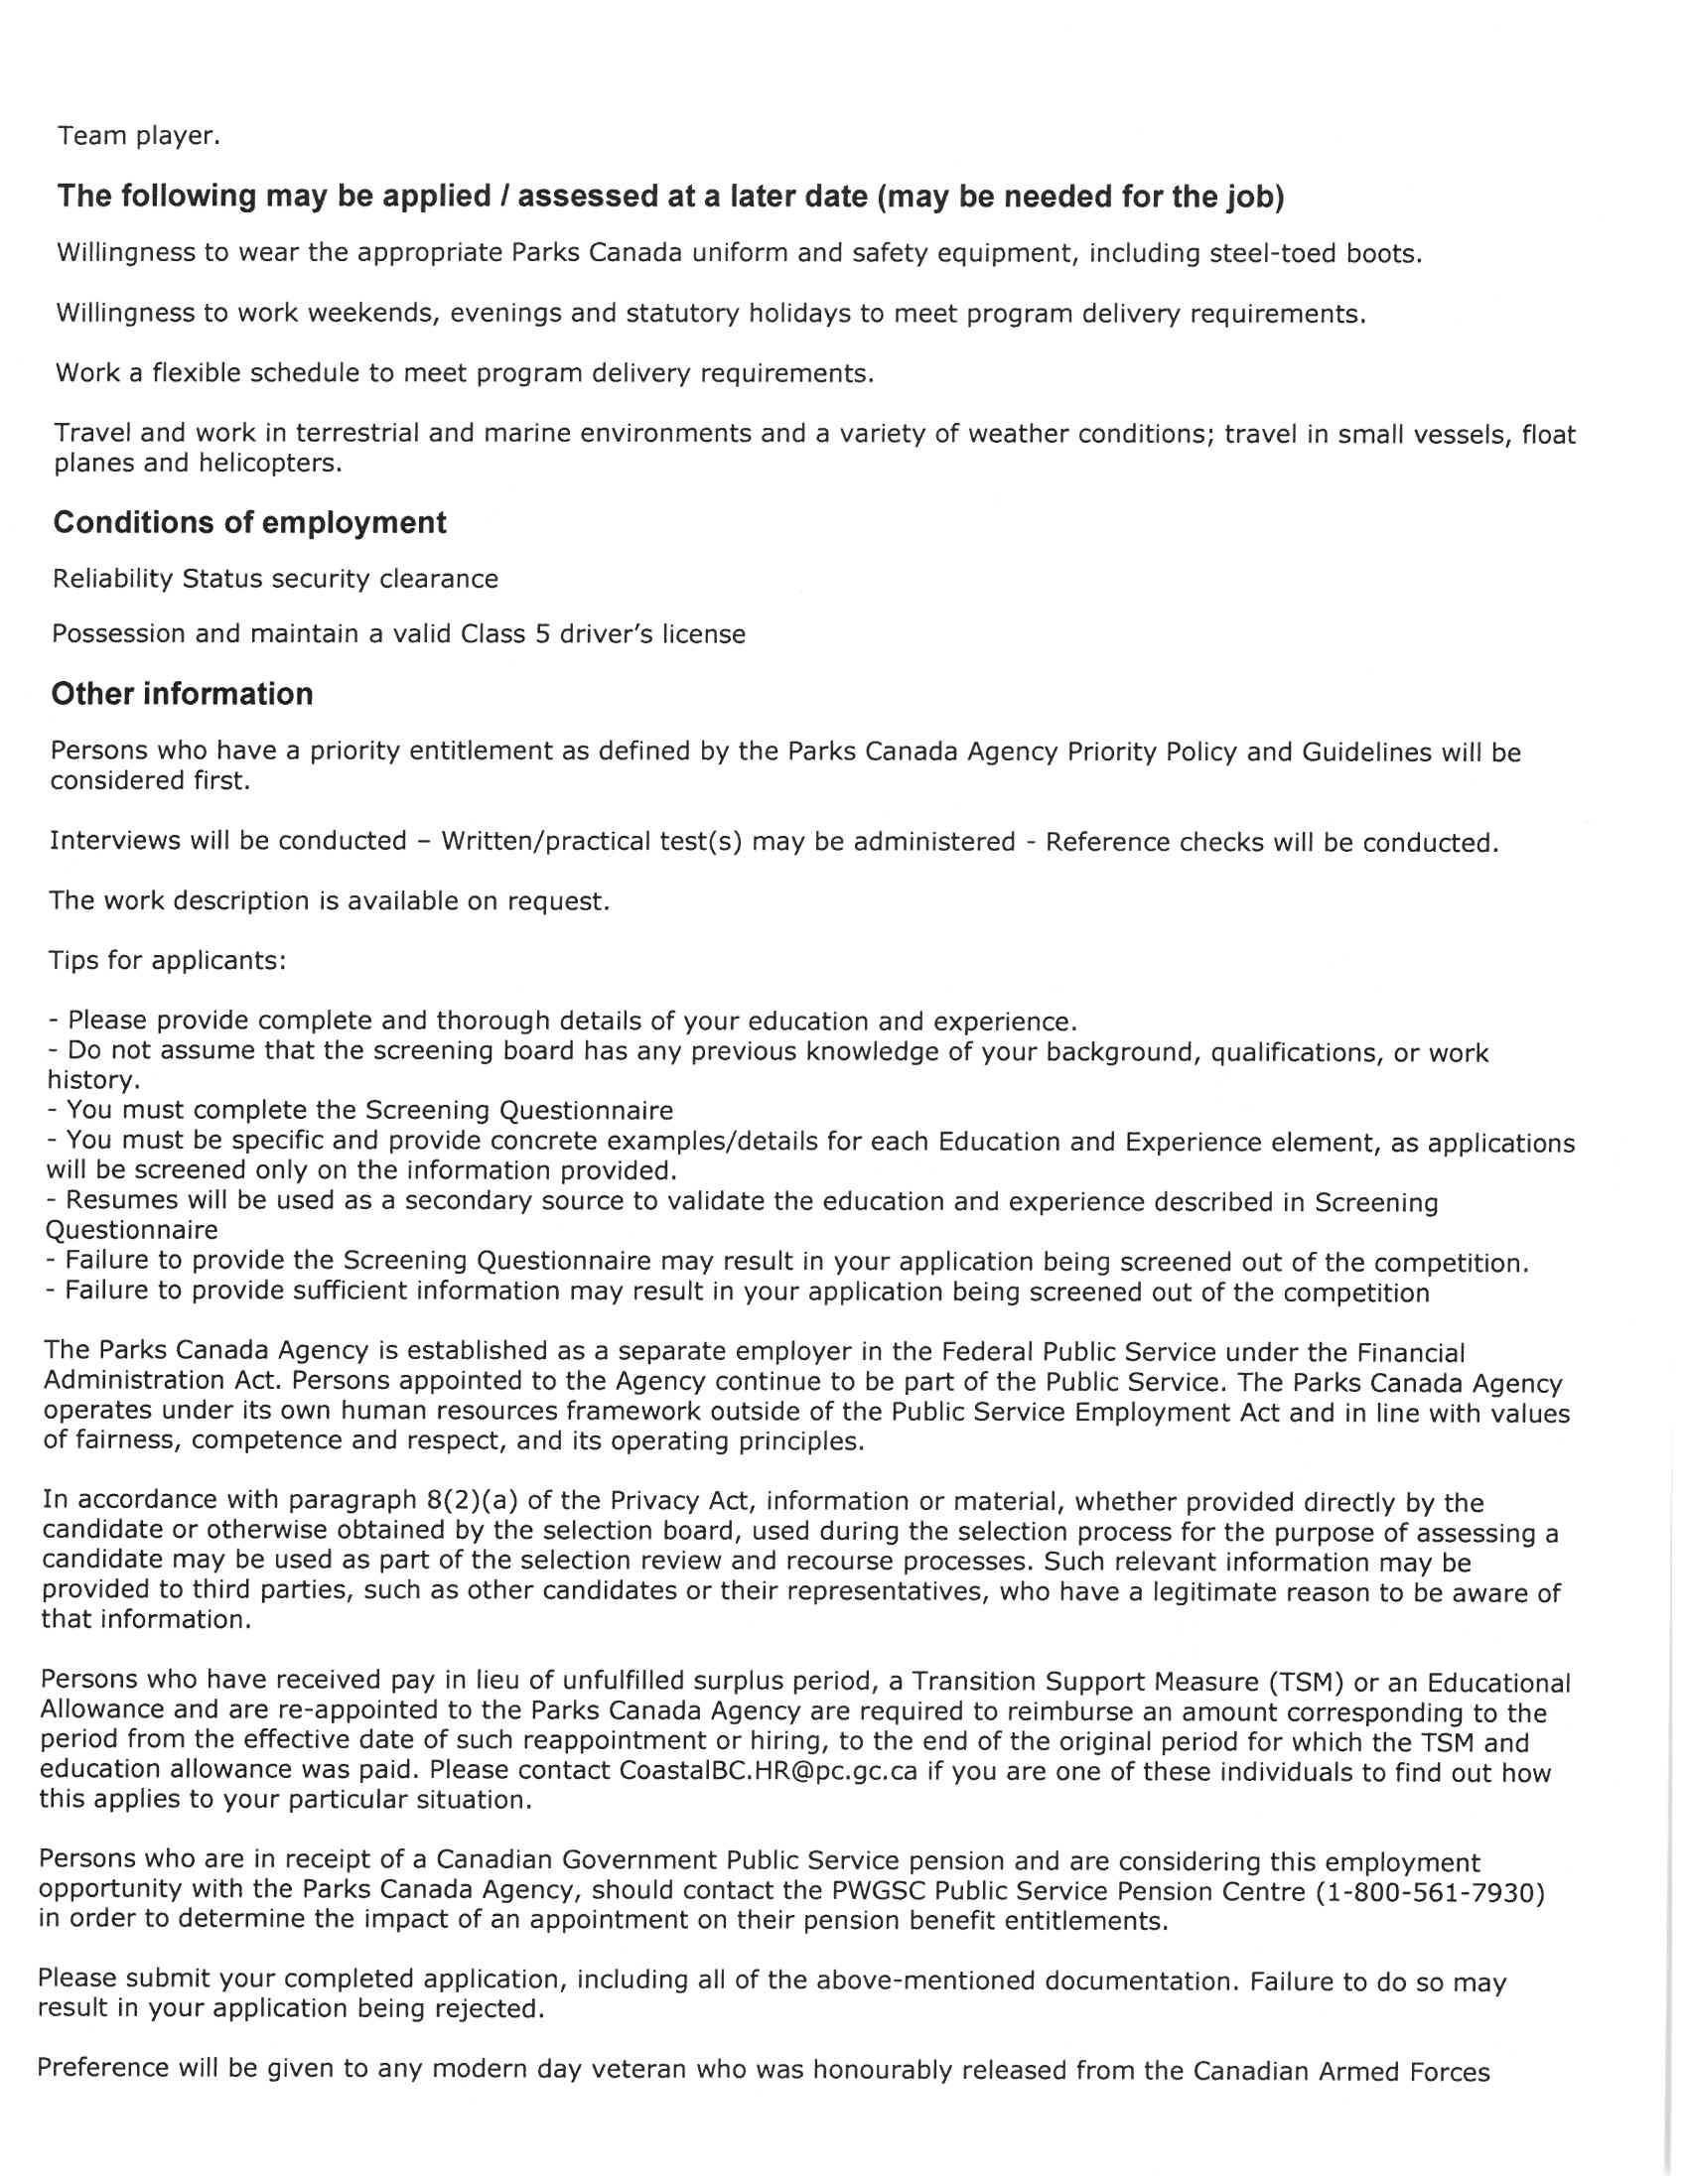 TFN Bulletin June 1-2016 Part 2_Page_05.jpg